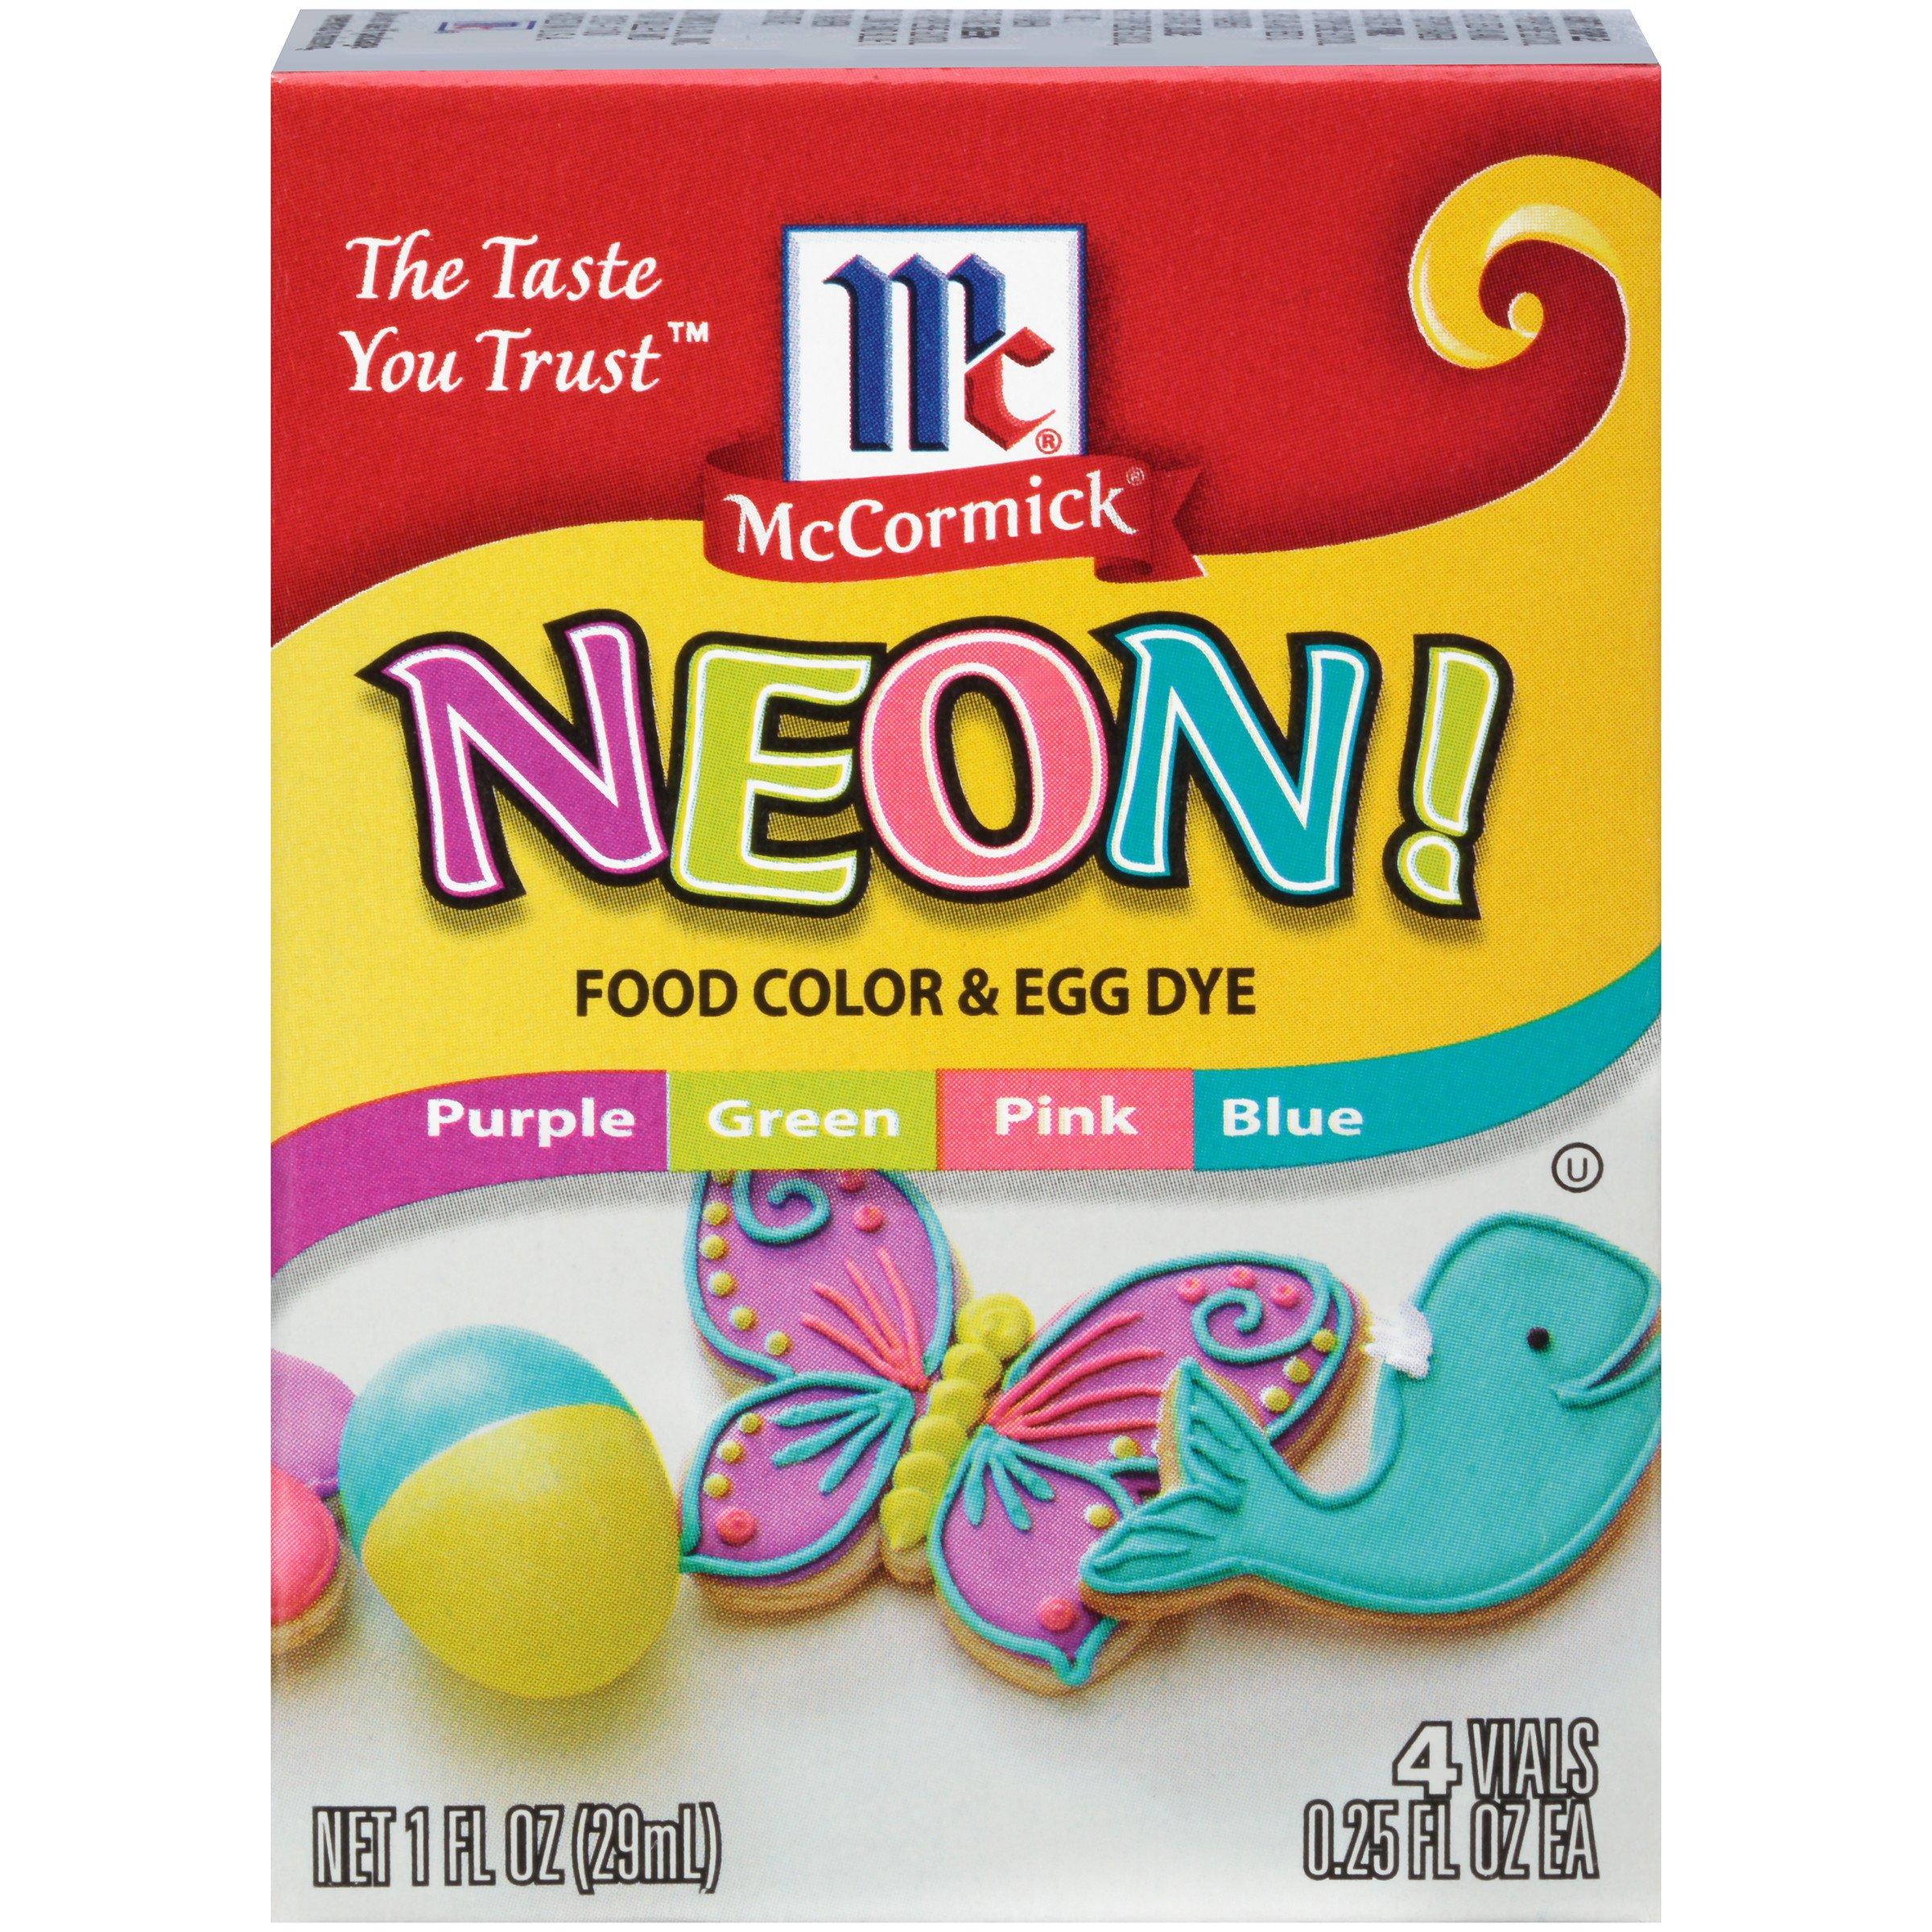 McCormick Food Colors & Egg Dye, 4 Neon Colors, 0.25 fl oz